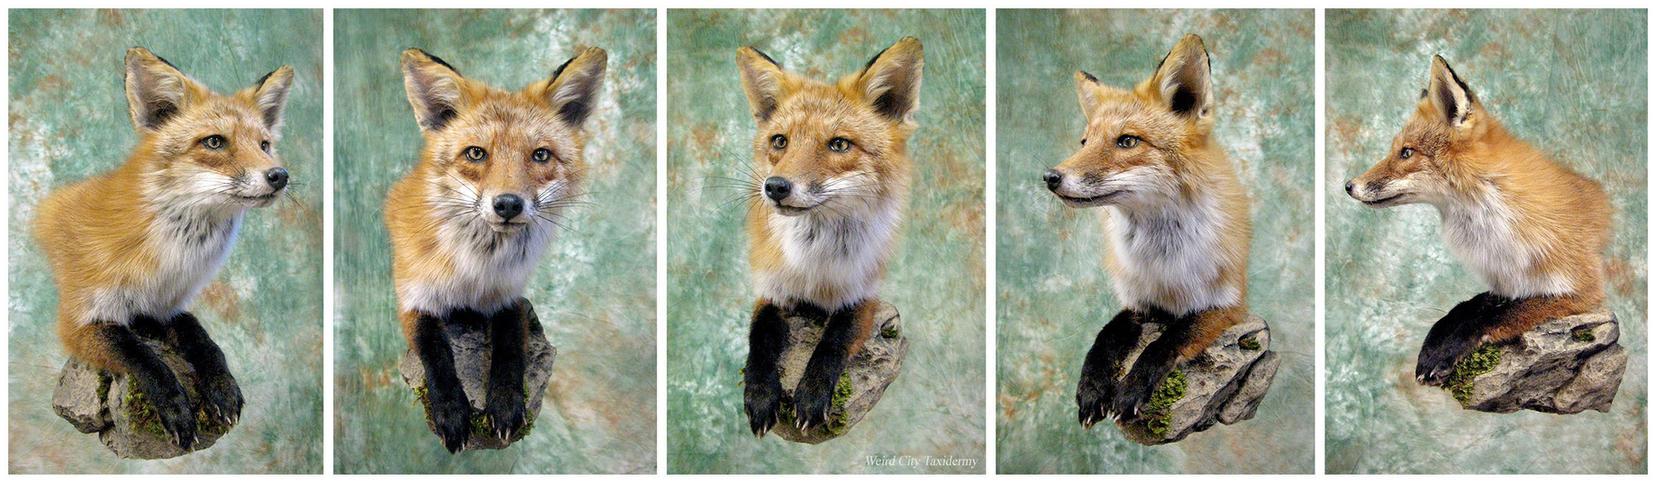 Red Fox on the Rocks by WeirdCityTaxidermy